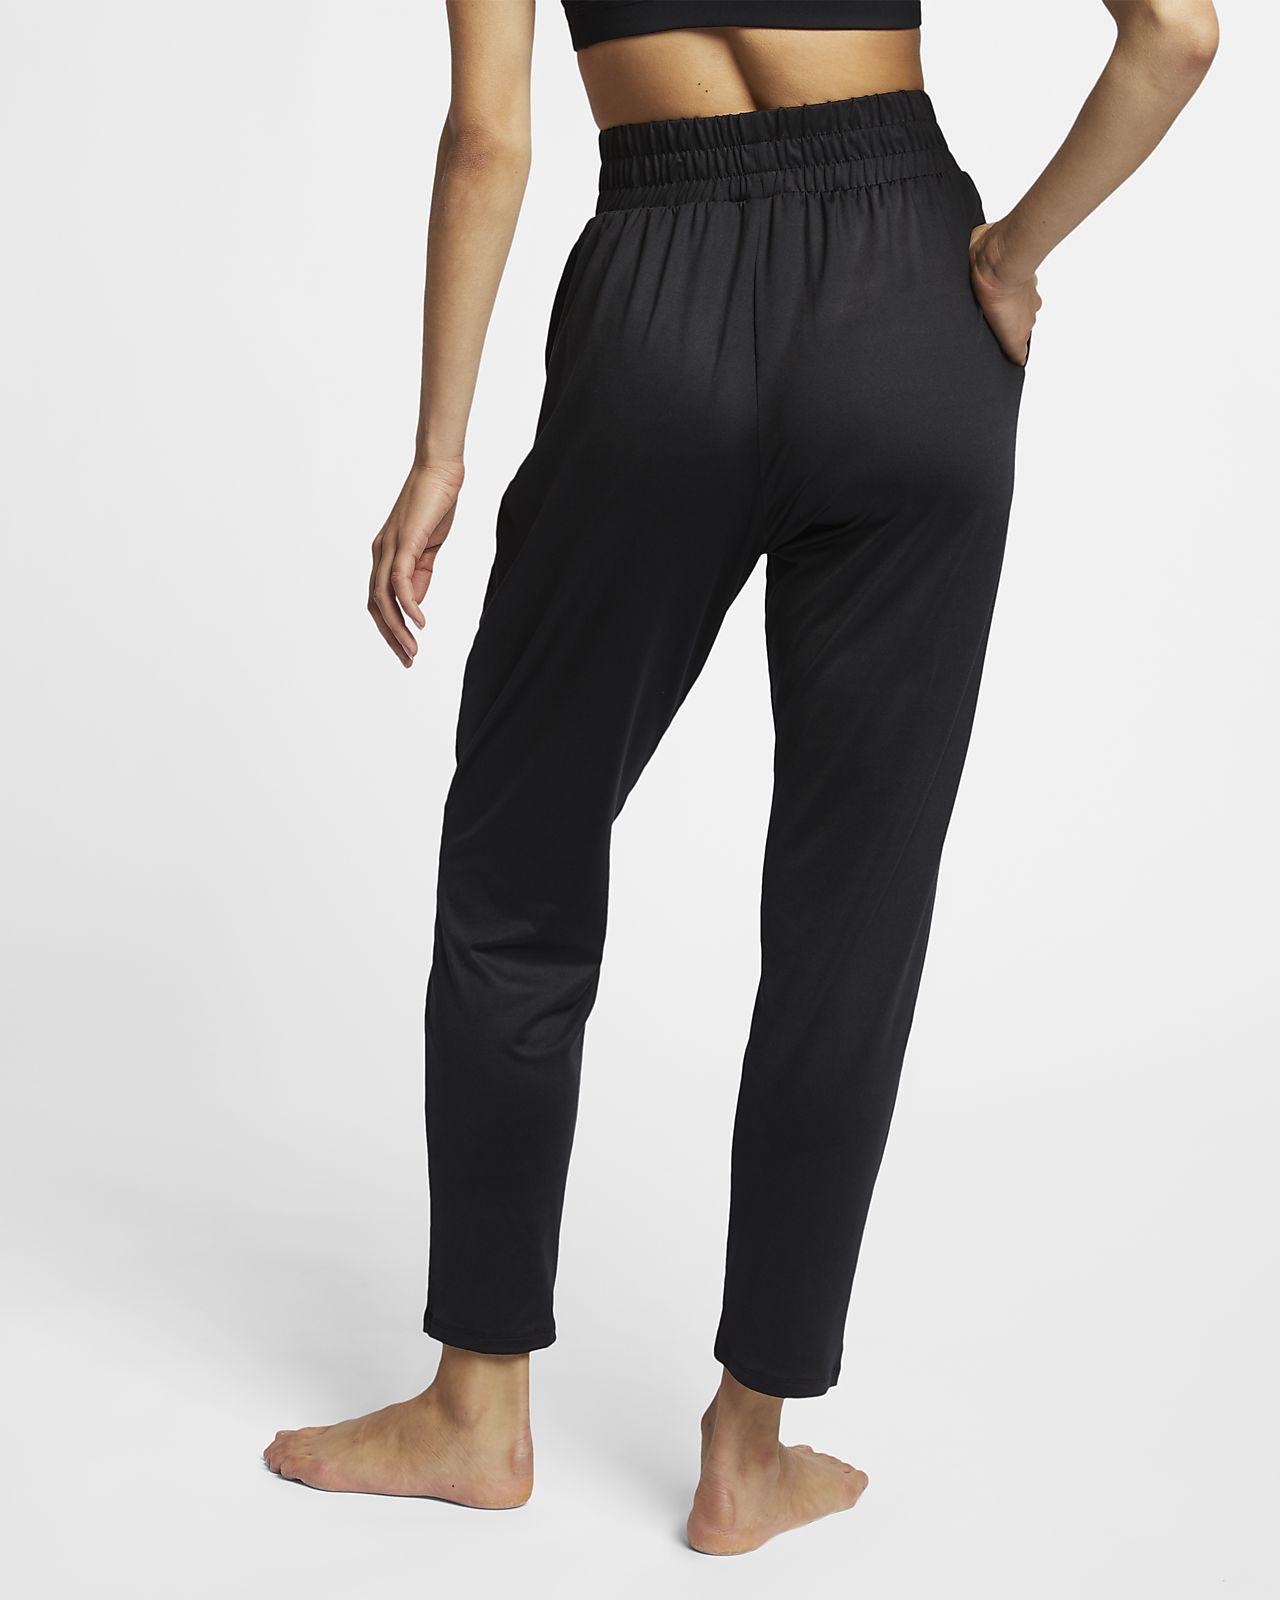 5b2f8d34cbdac De Pantalon Femme Pour Yoga D entraînement Flow Nike Fr ZqSnxq5r7w